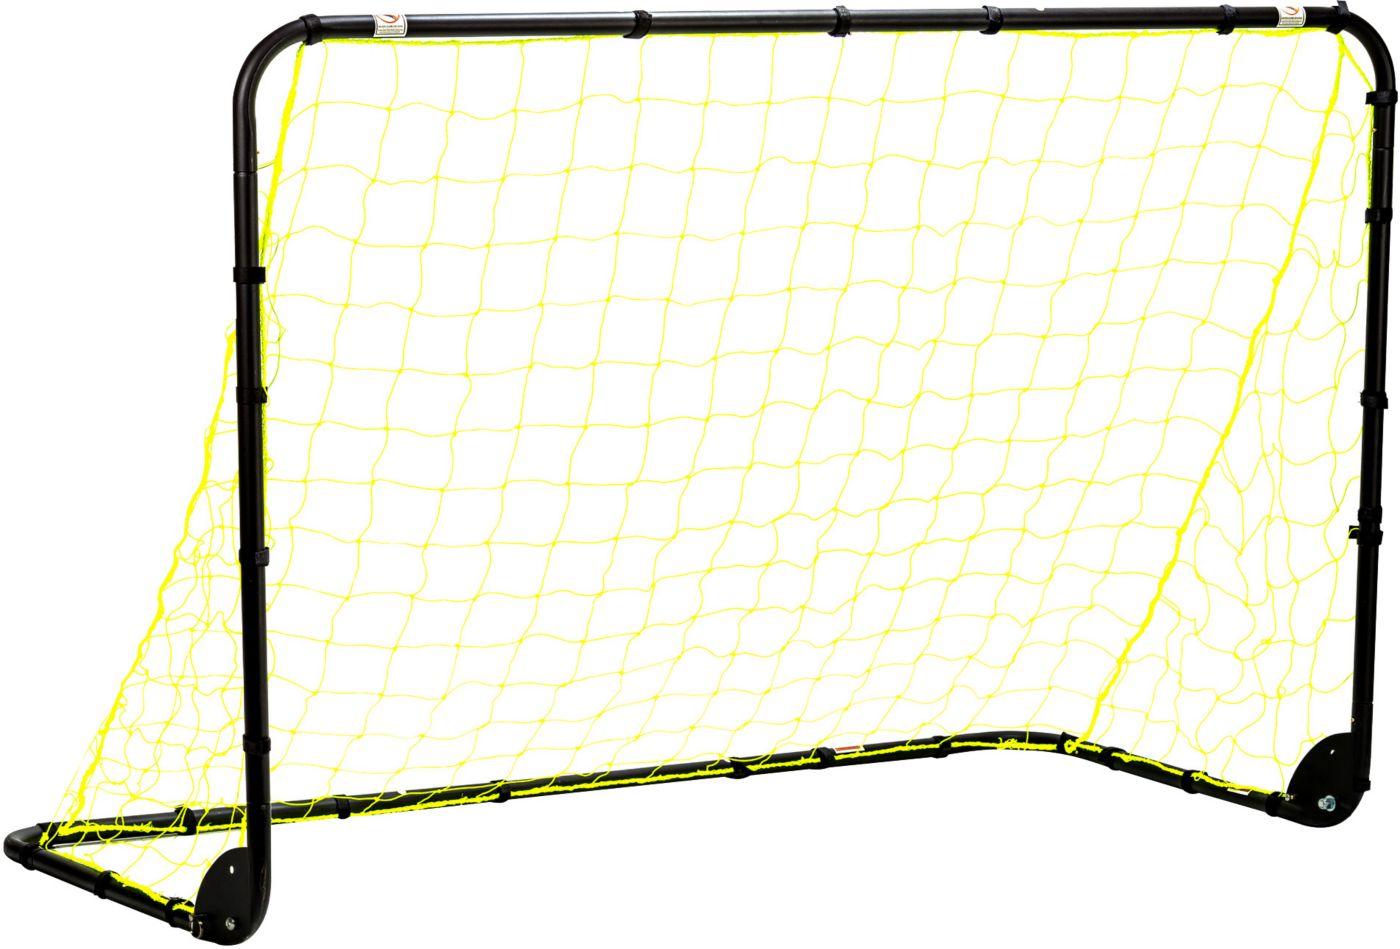 Franklin 6' x 4' Powder-Coated Steel Folding Soccer Goal